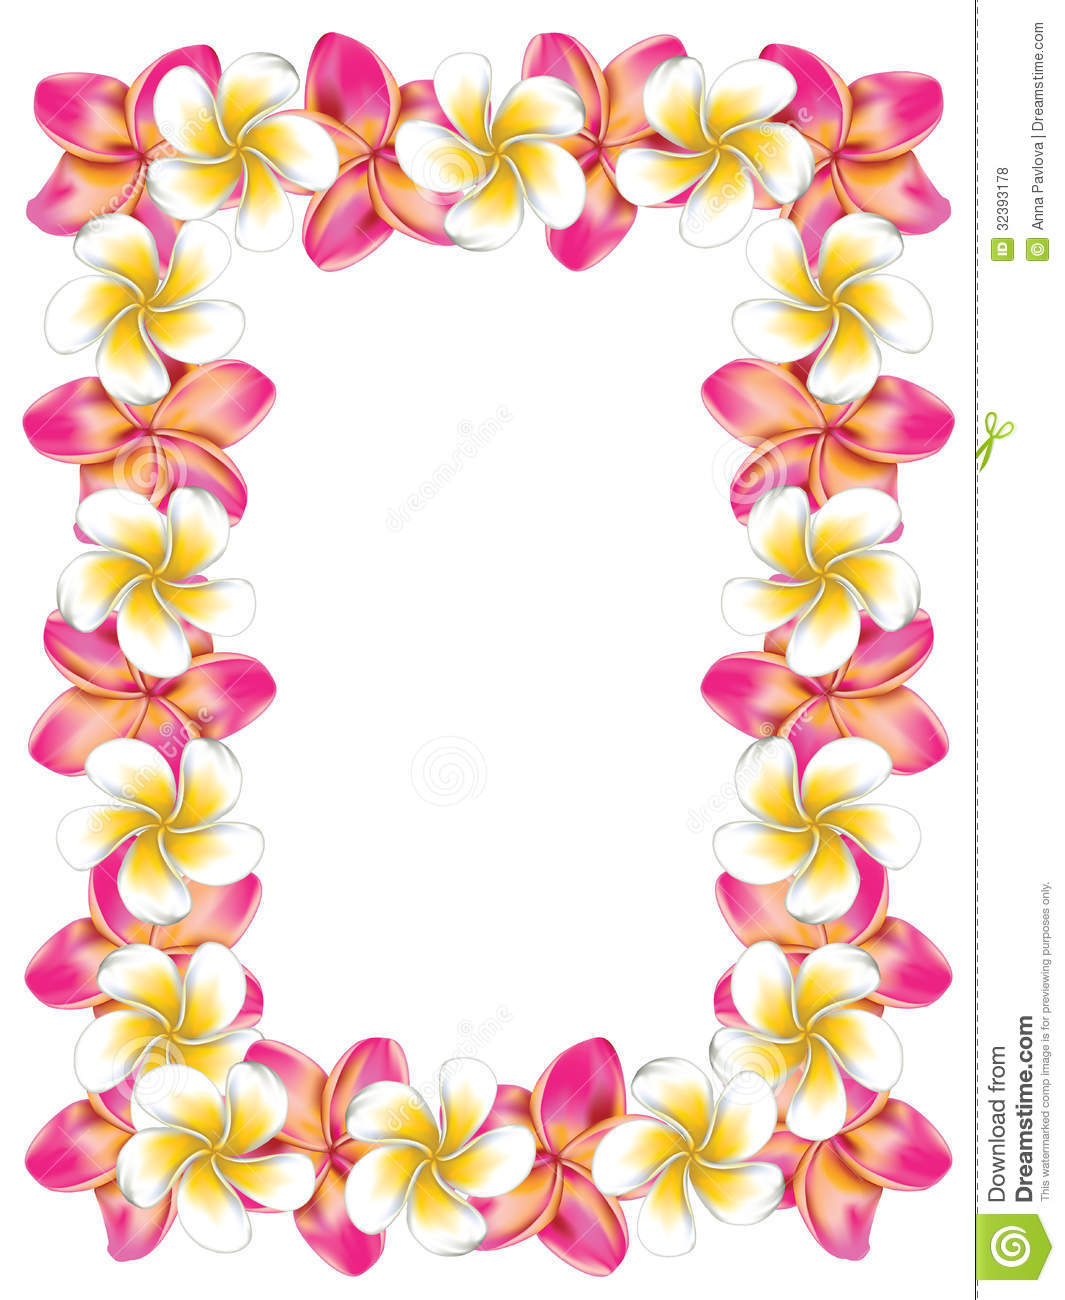 Hawaiian Frames Clipart - Clipart Kid